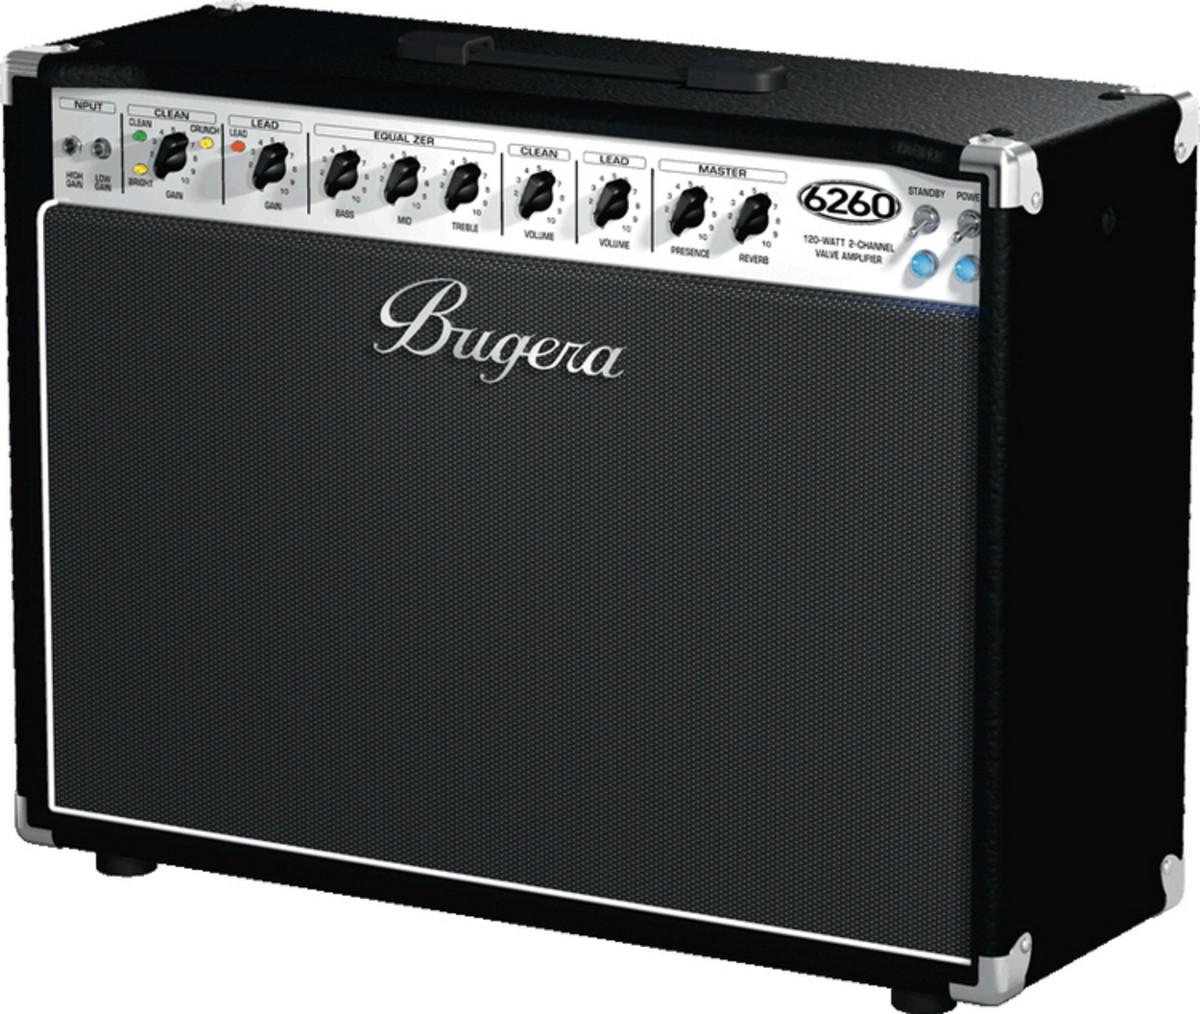 disc bugera 6260 212 120w guitar combo amp at. Black Bedroom Furniture Sets. Home Design Ideas